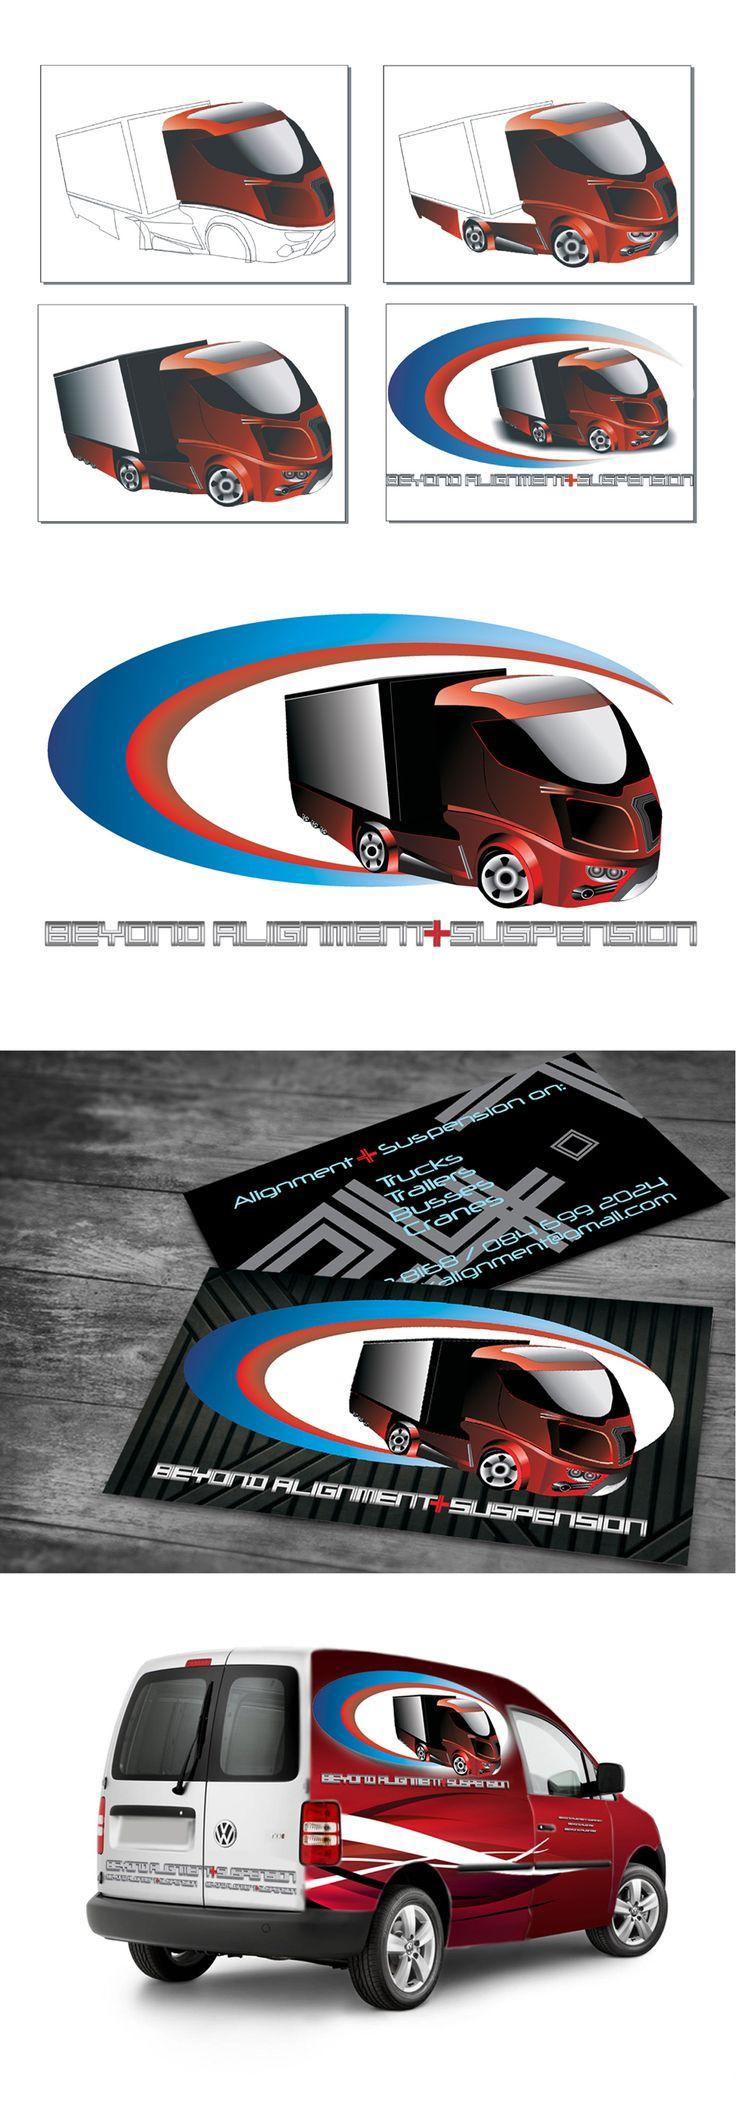 Logo Design,Business Card Design and Printing. Vehicle branding design and wrapping. #logo #design #branding #printing #vehicle# #wrapping # businesscard